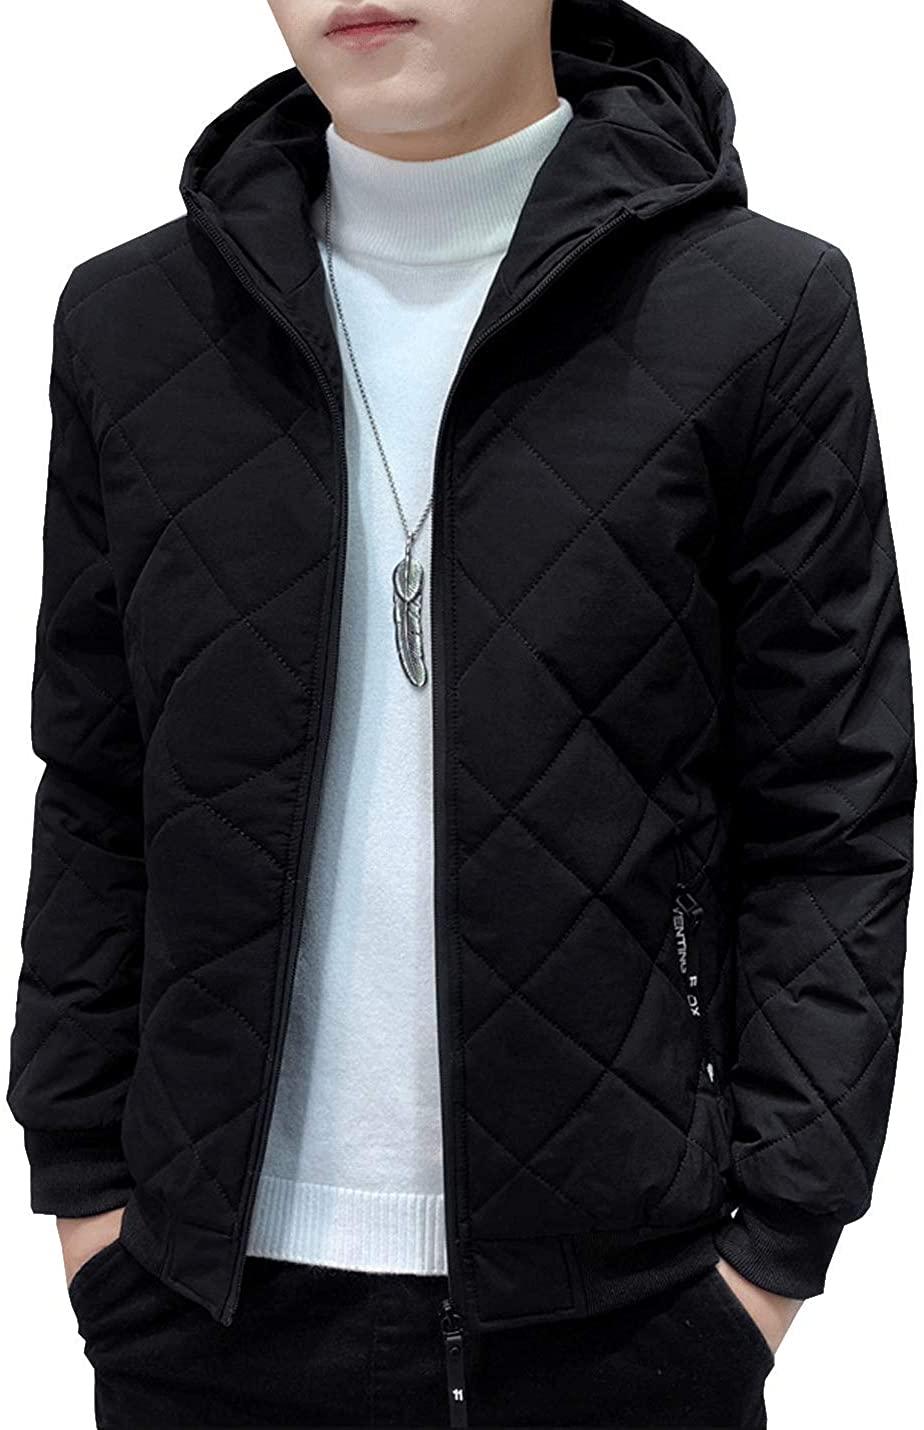 D.B.M Men's Lightweight Velvet Warm Long-Sleeved Hooded Quilted Cotton Jacket